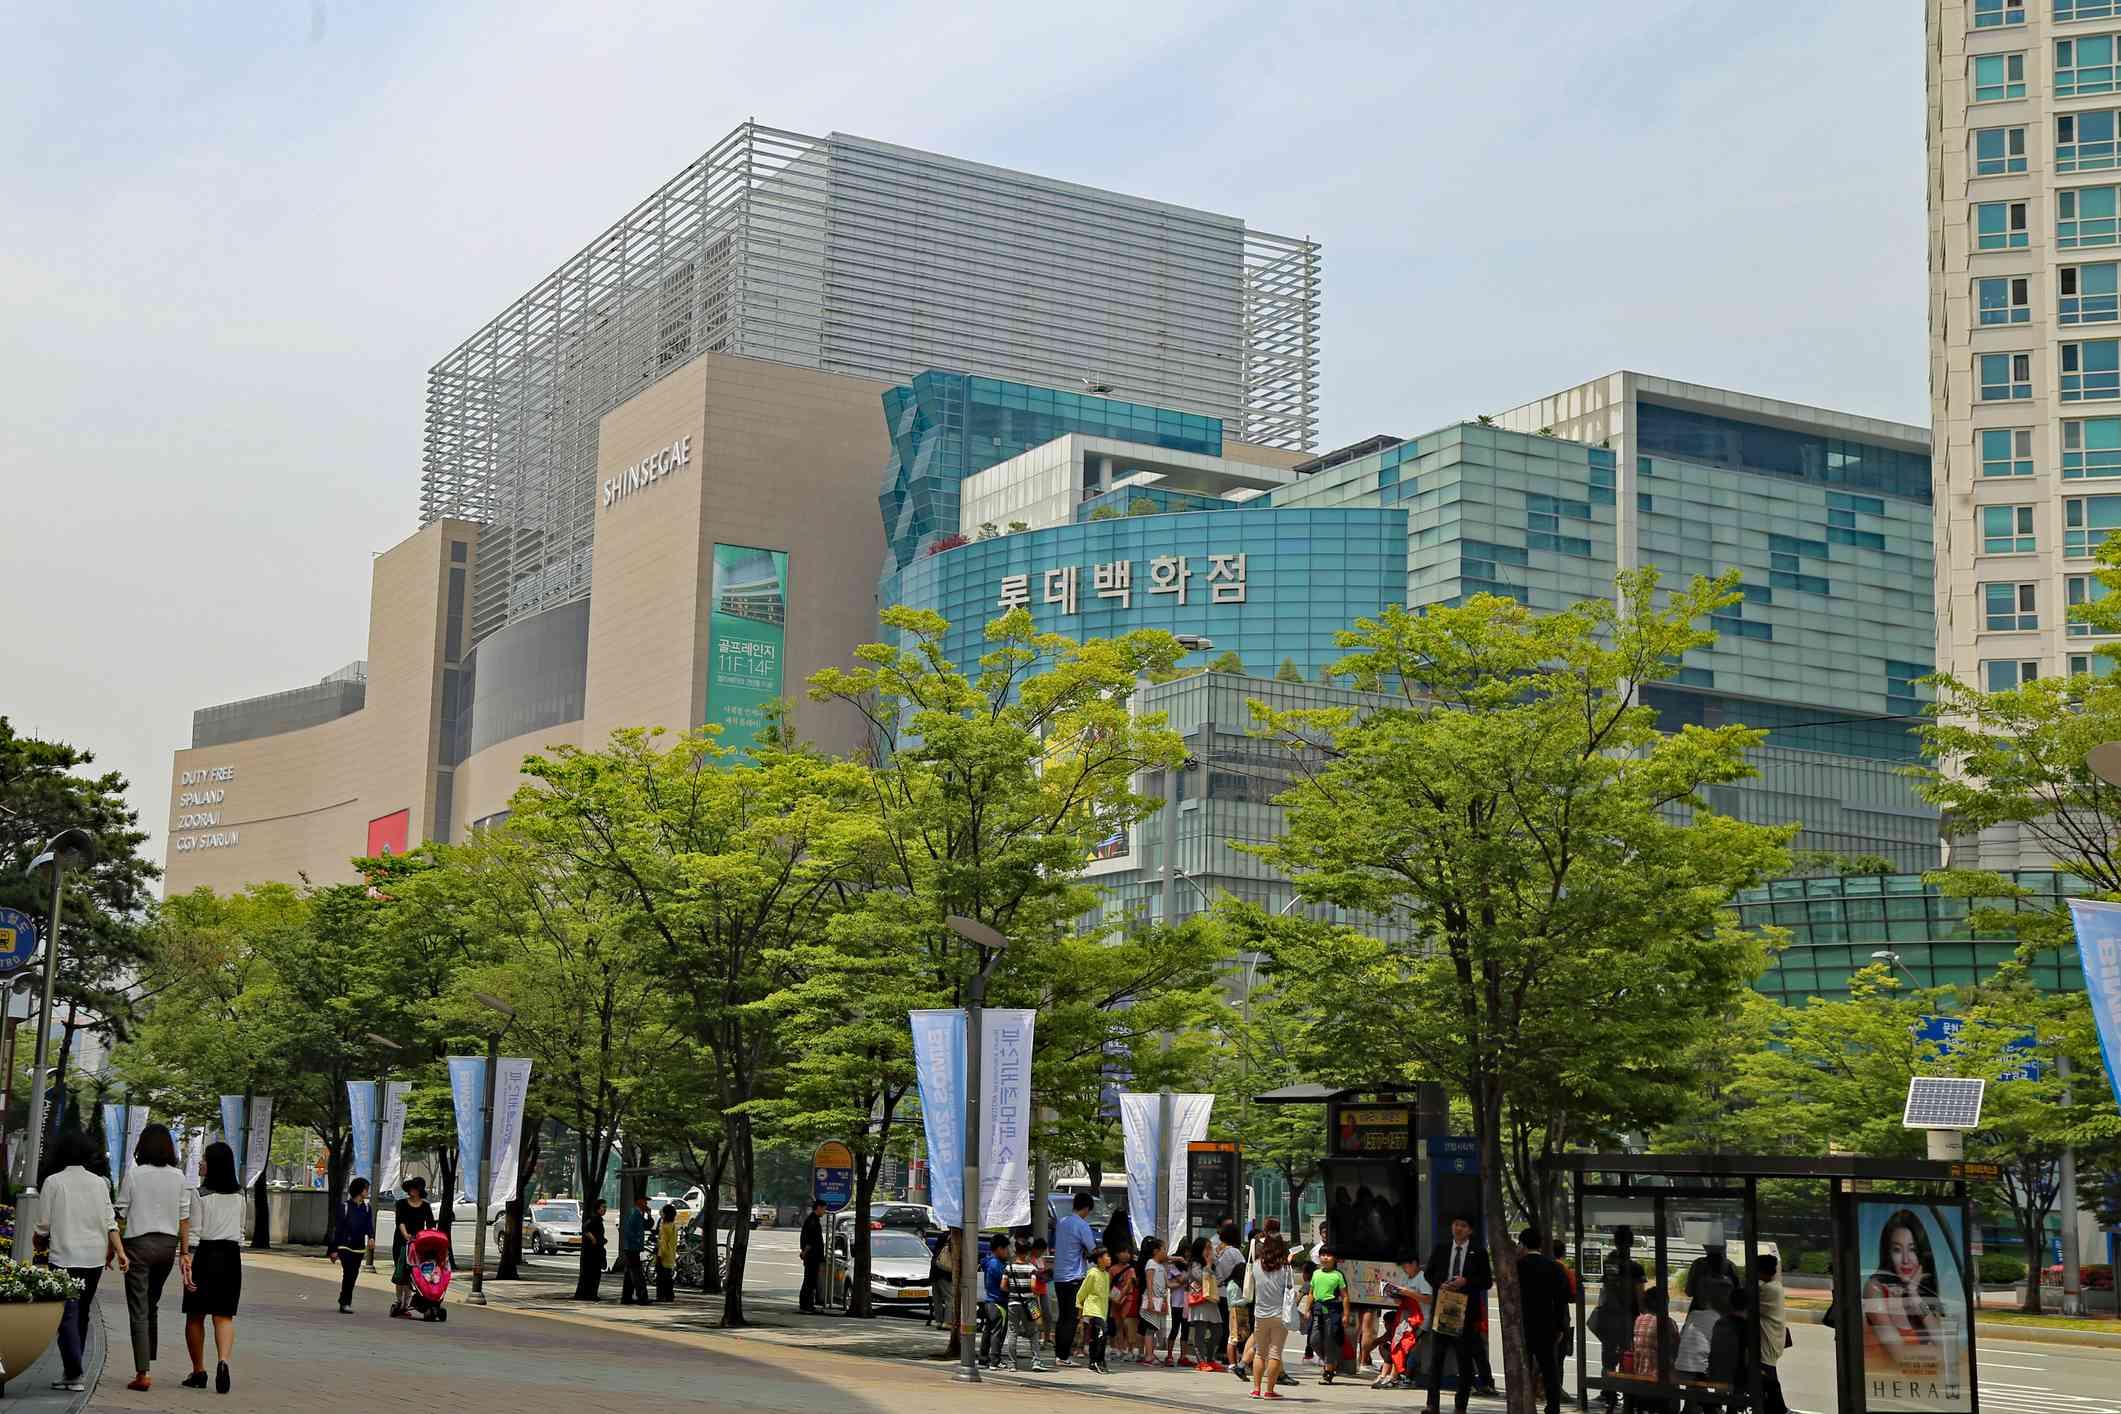 Shinsegae Centum City Department Store, Busan, Korea